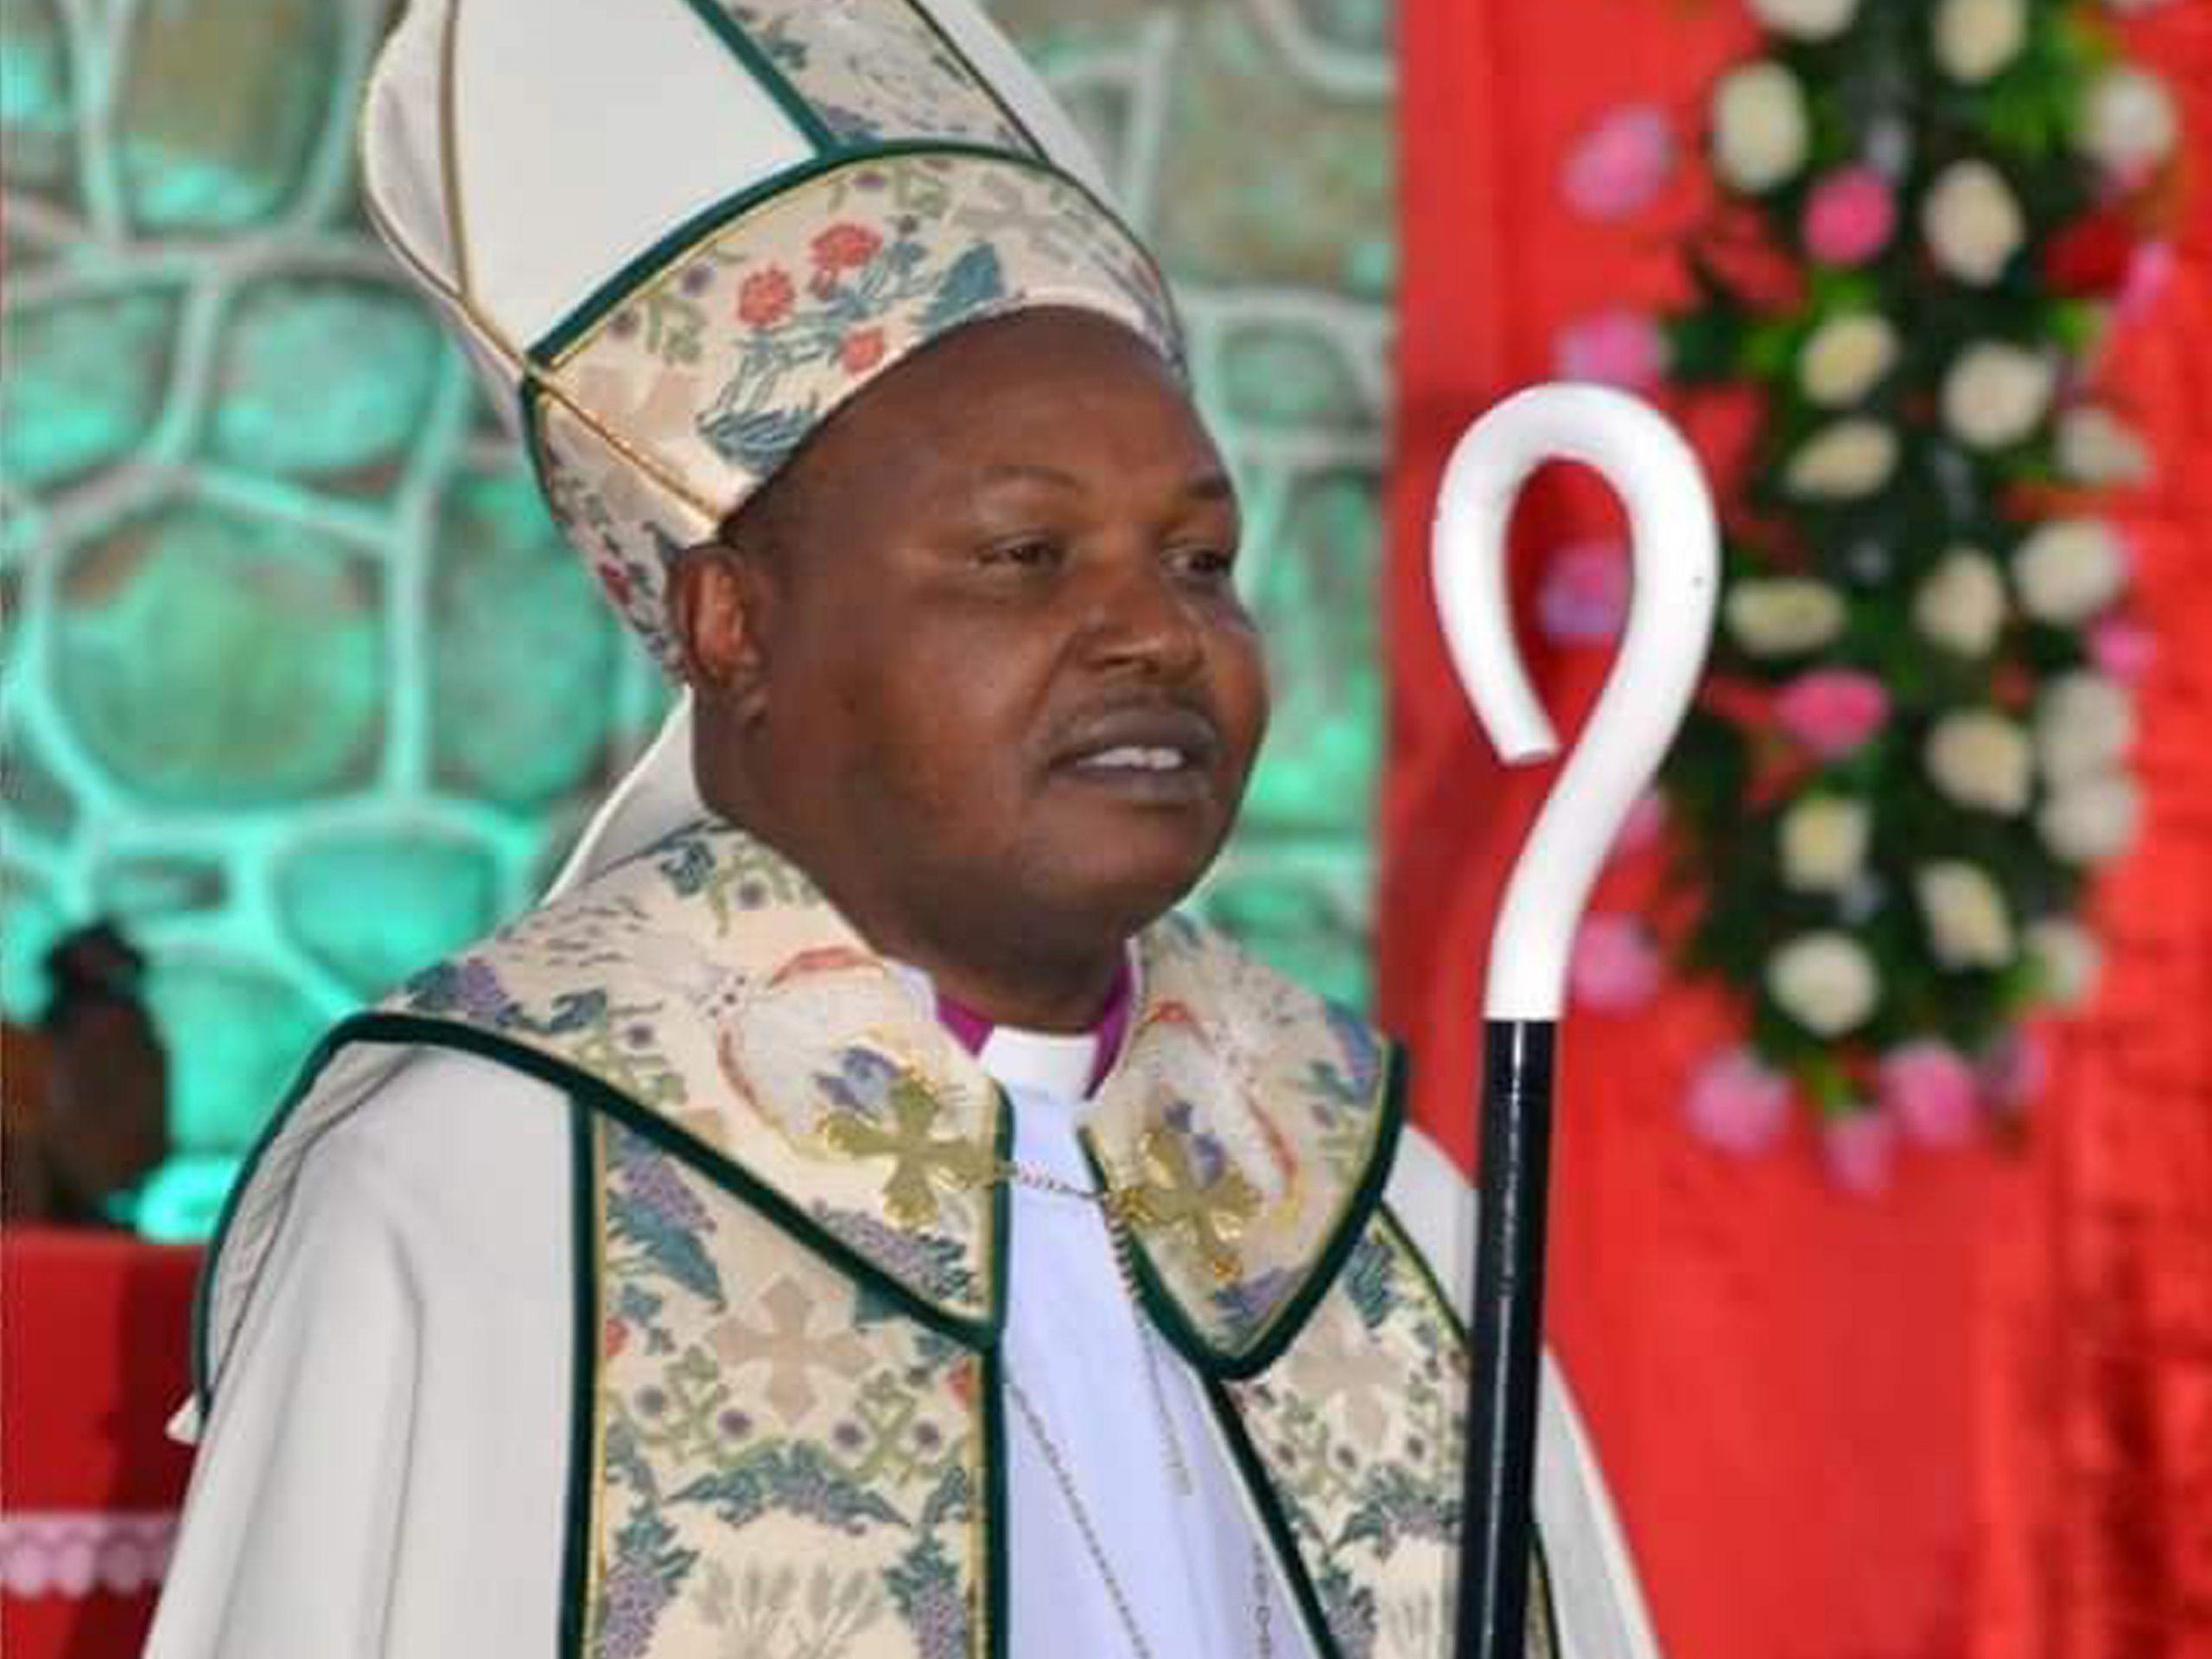 New Testament Professor is new bishop of Tanzanian Lutheran Church